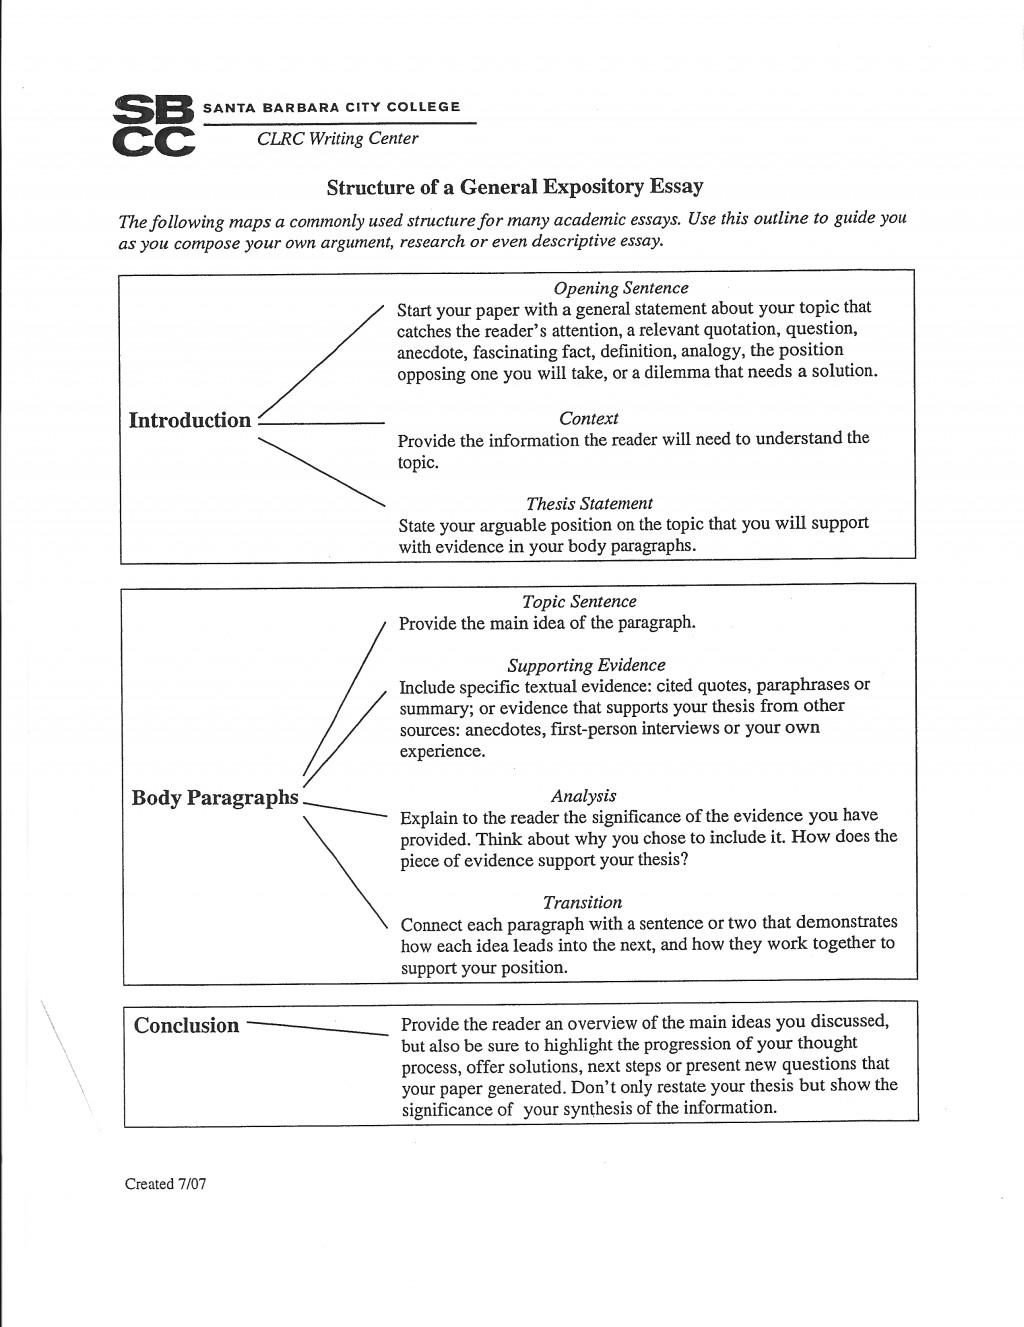 008 Process Essay Outline Fantastic Template Pdf Large